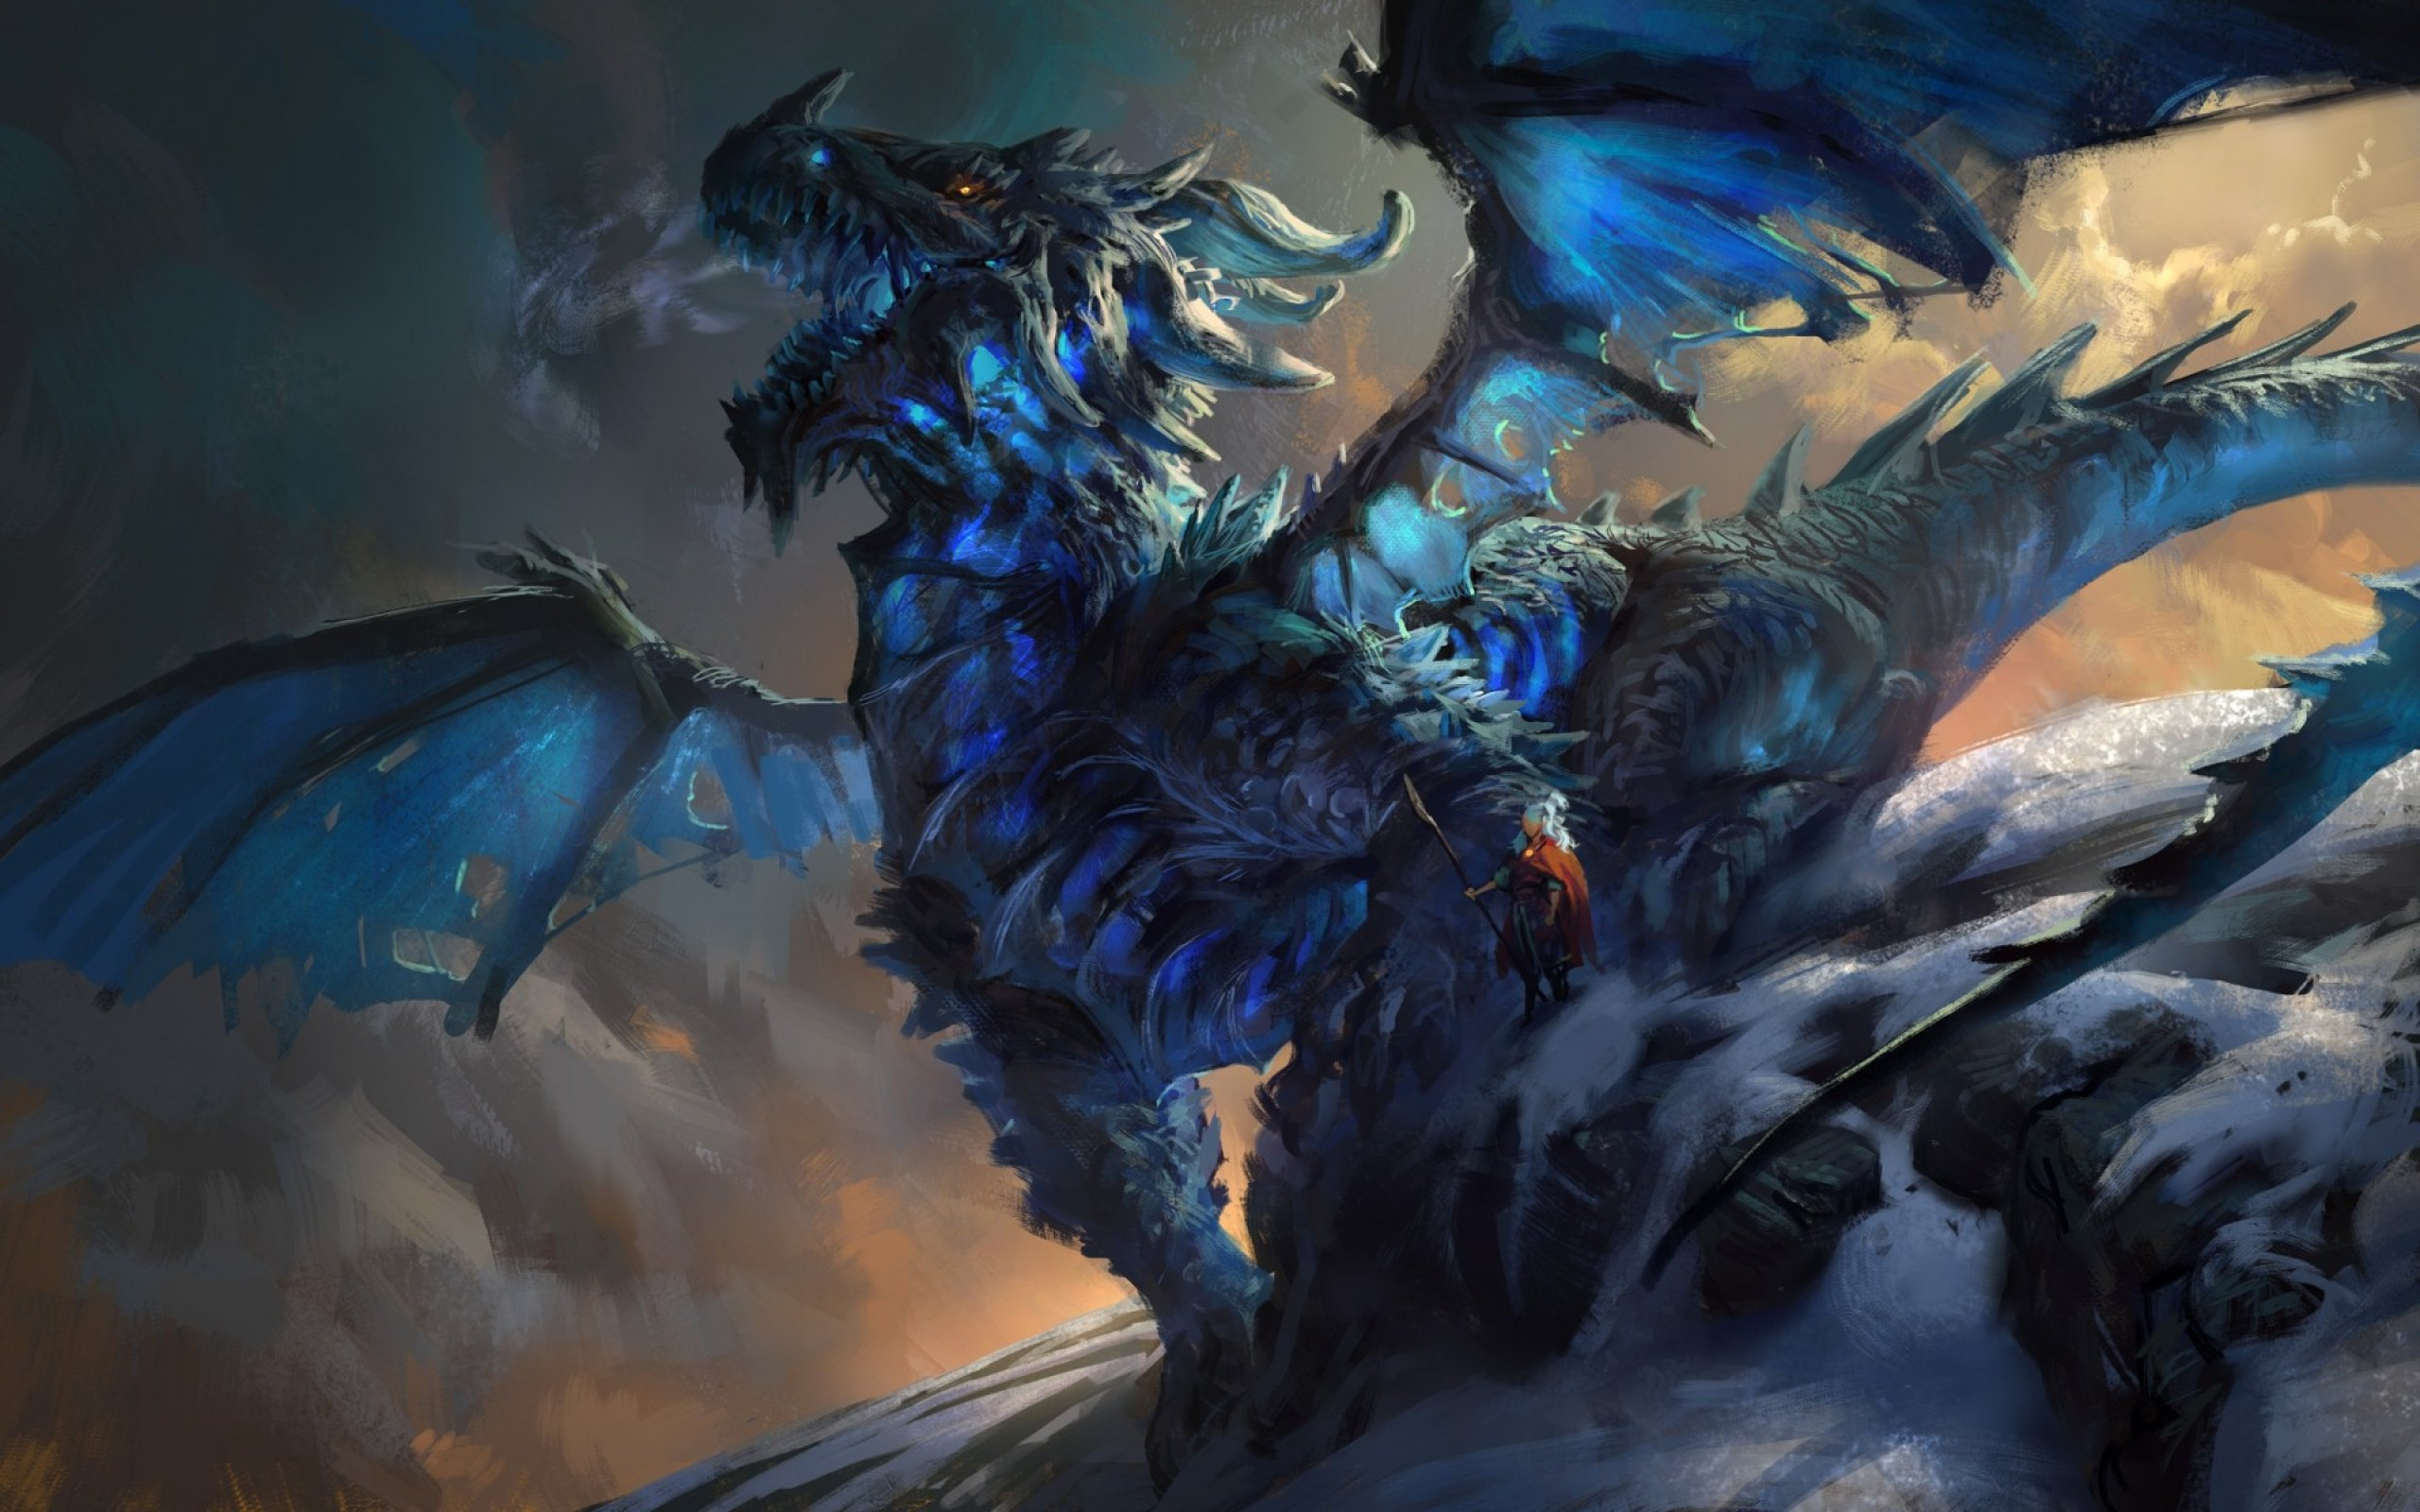 realistic 3d moving dragon wallpaper - photo #28